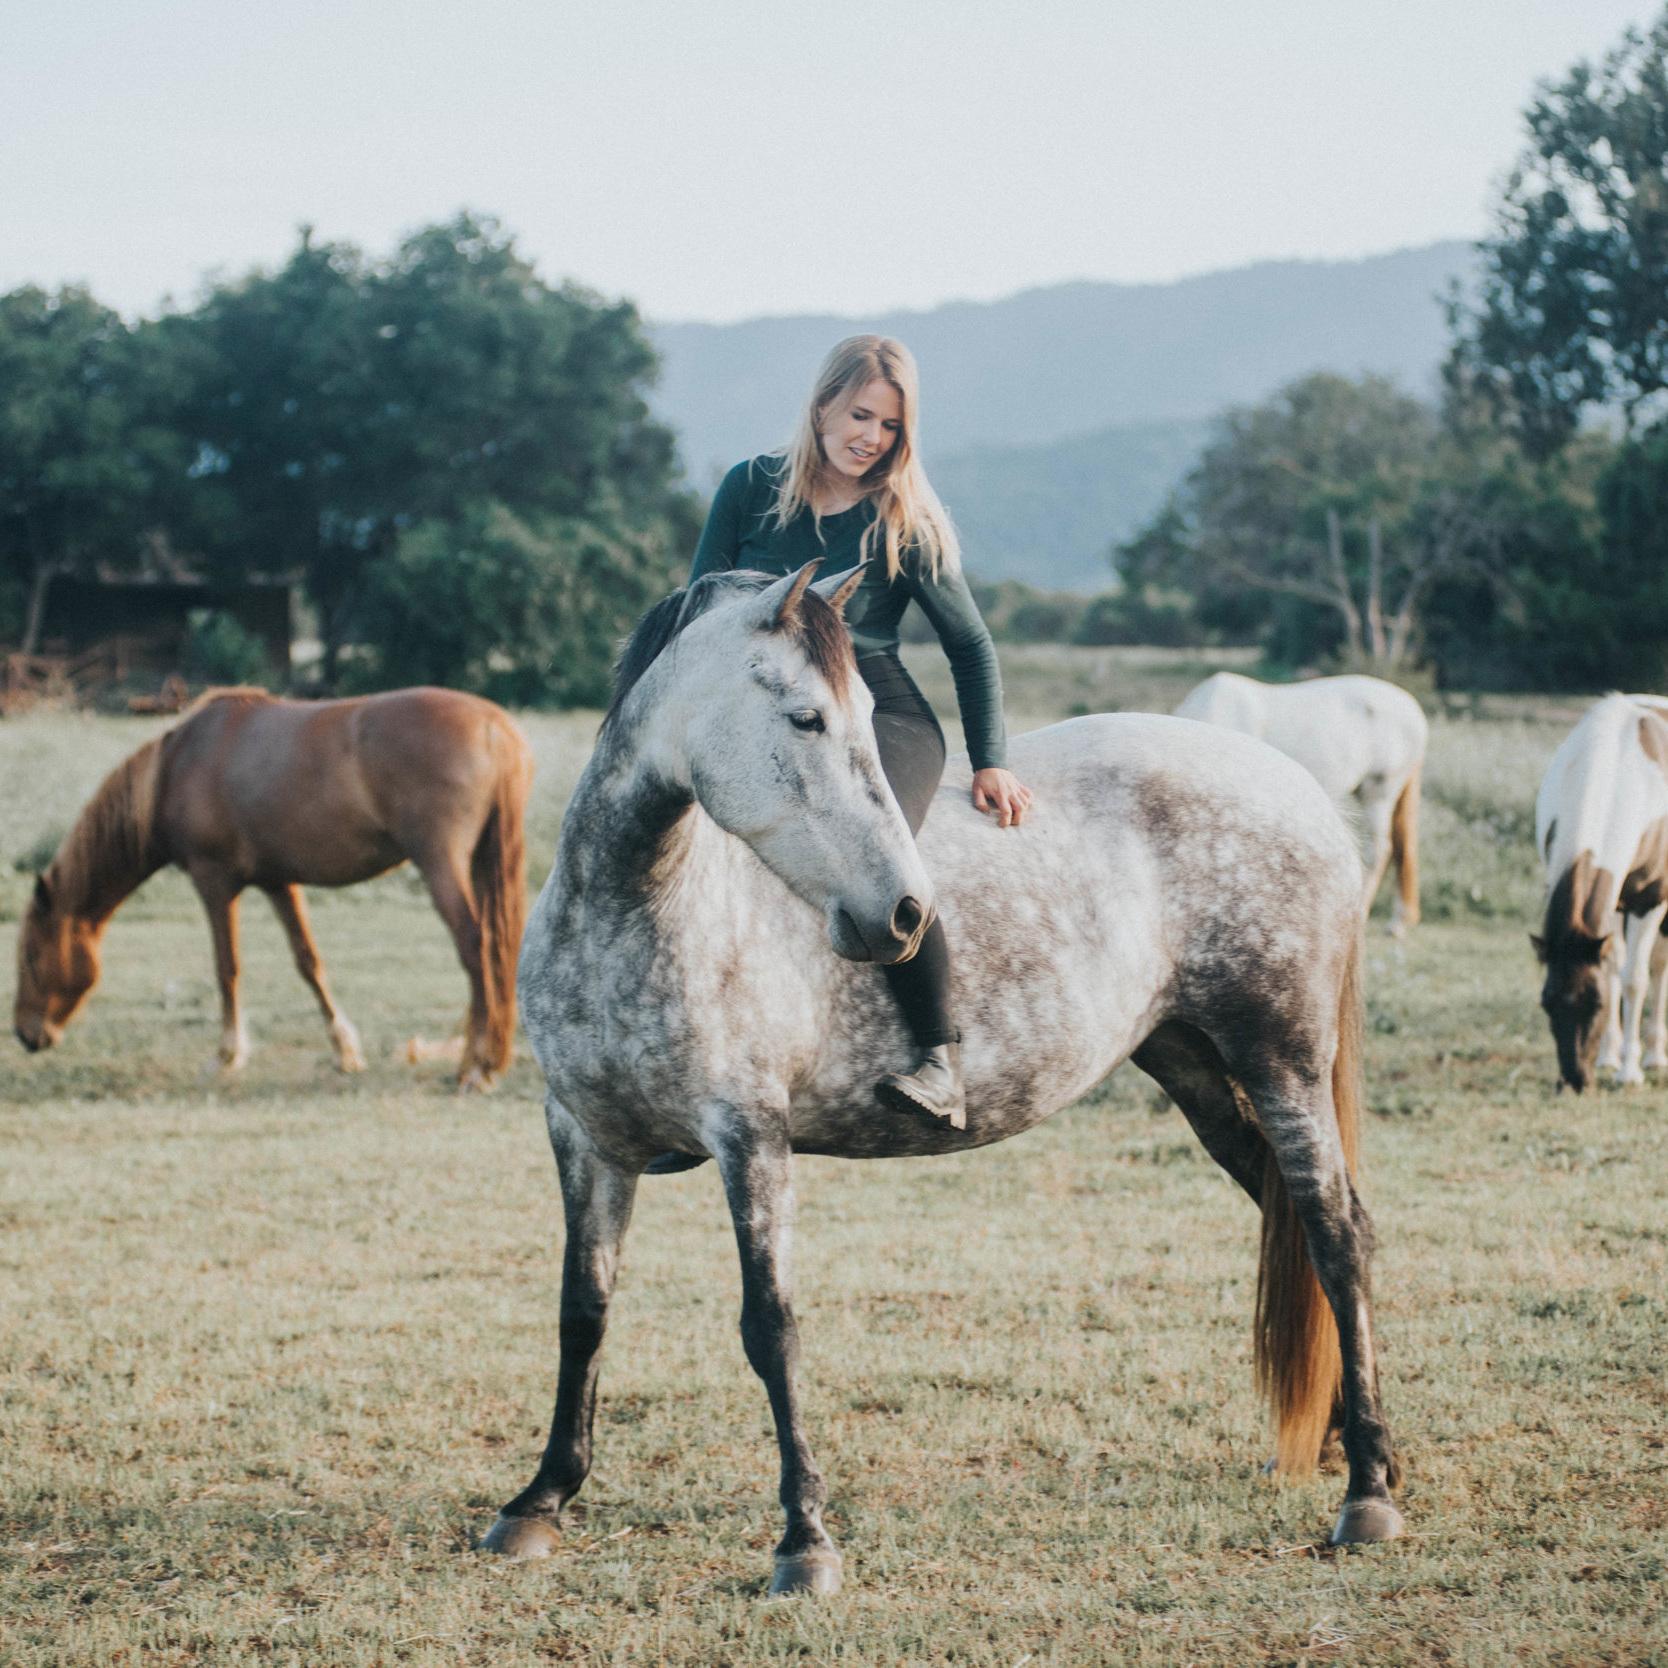 Mosie Trewhitt - Liberty Horsemanship & Voices of the Herd